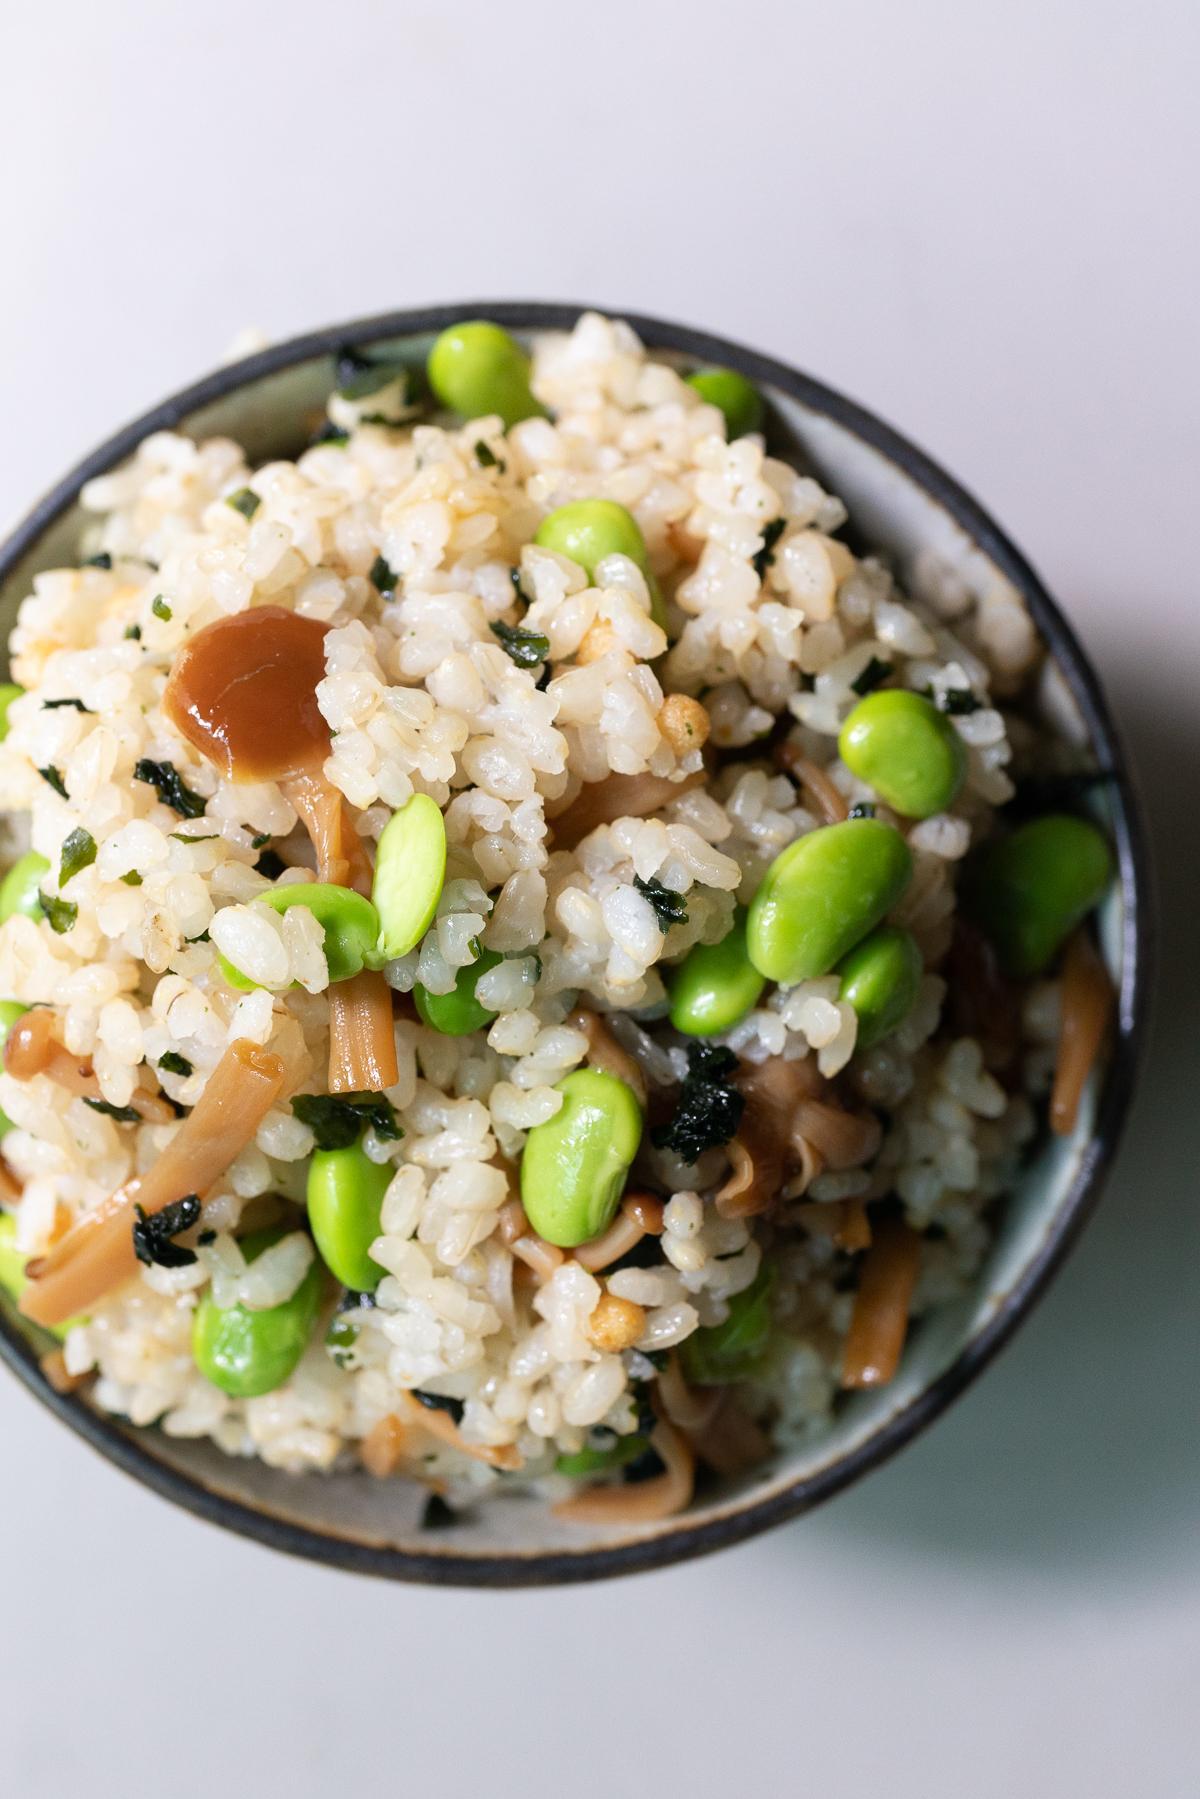 Edamame and nametake rice in a bowl